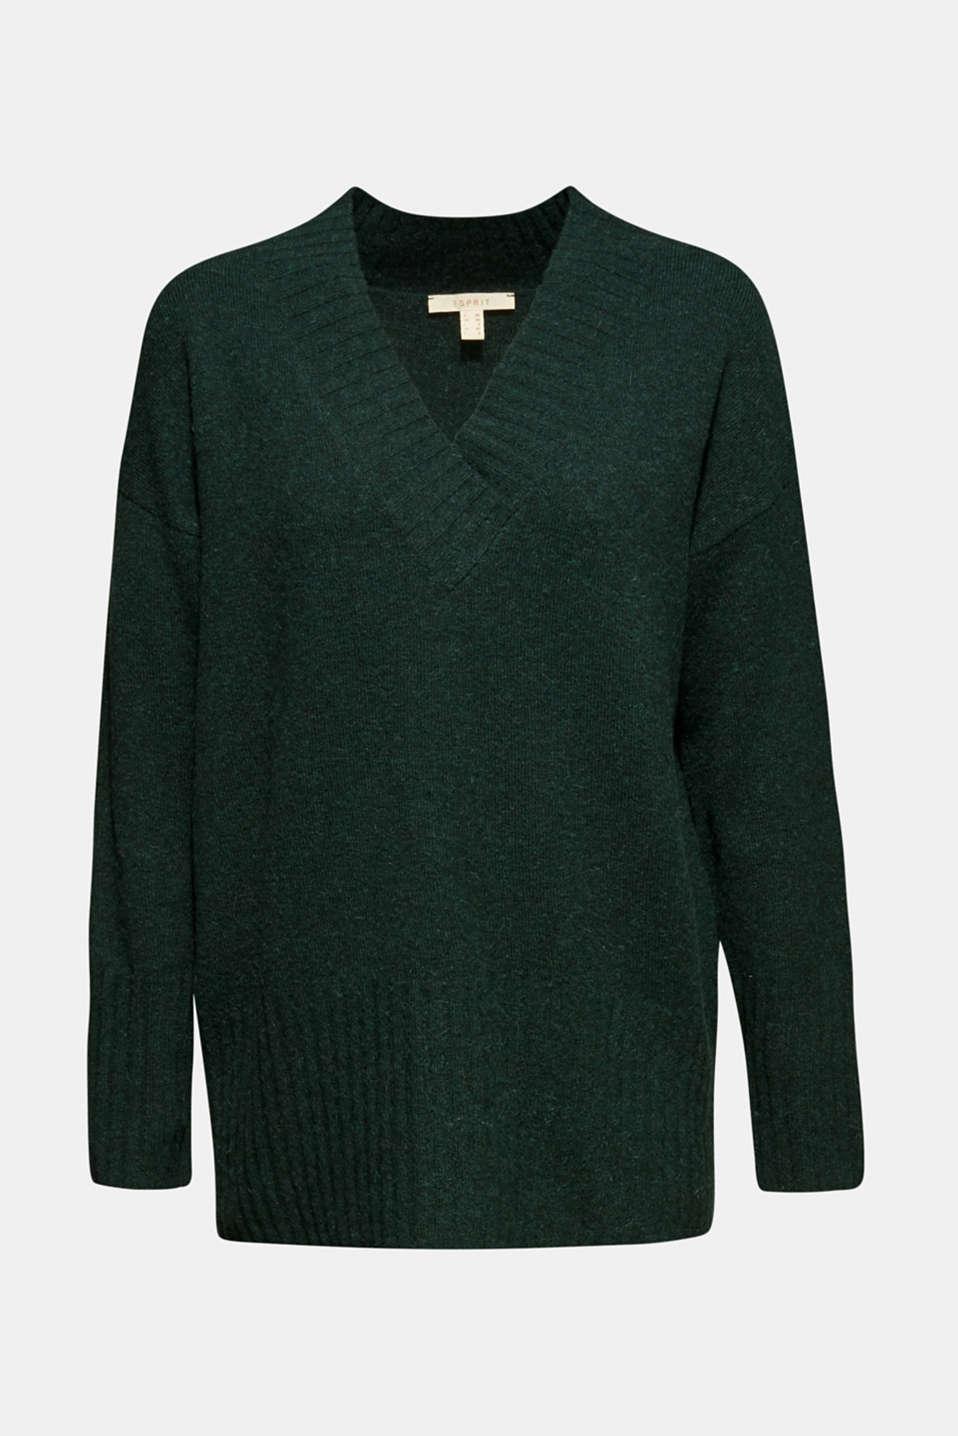 Sweaters, DARK TEAL GREEN 5, detail image number 5